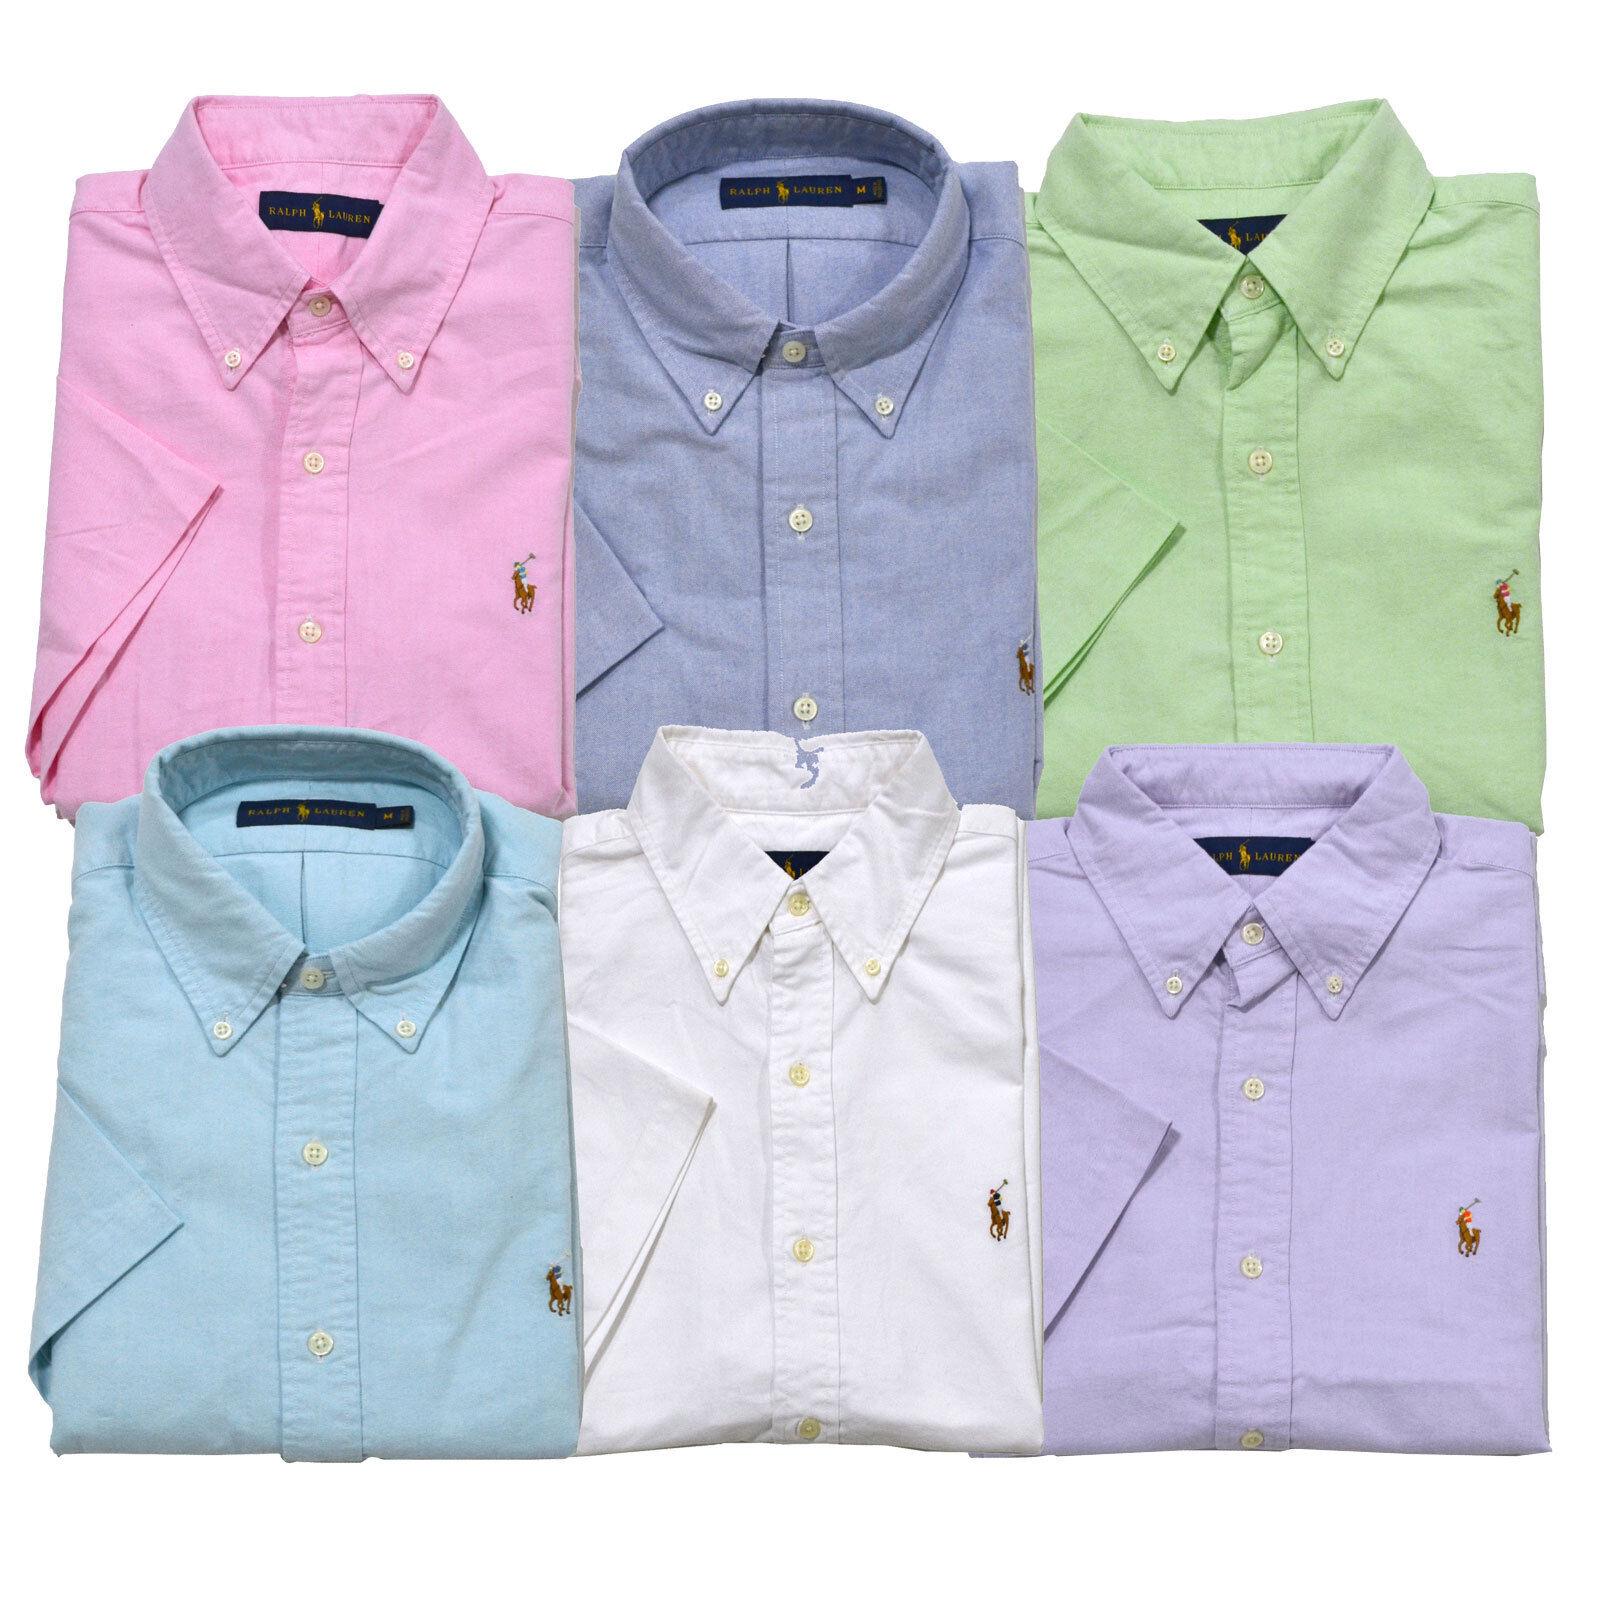 Polo Ralph Lauren Shirt Oxford Button Down Mens Short Sleeve Casual S M L Xl New